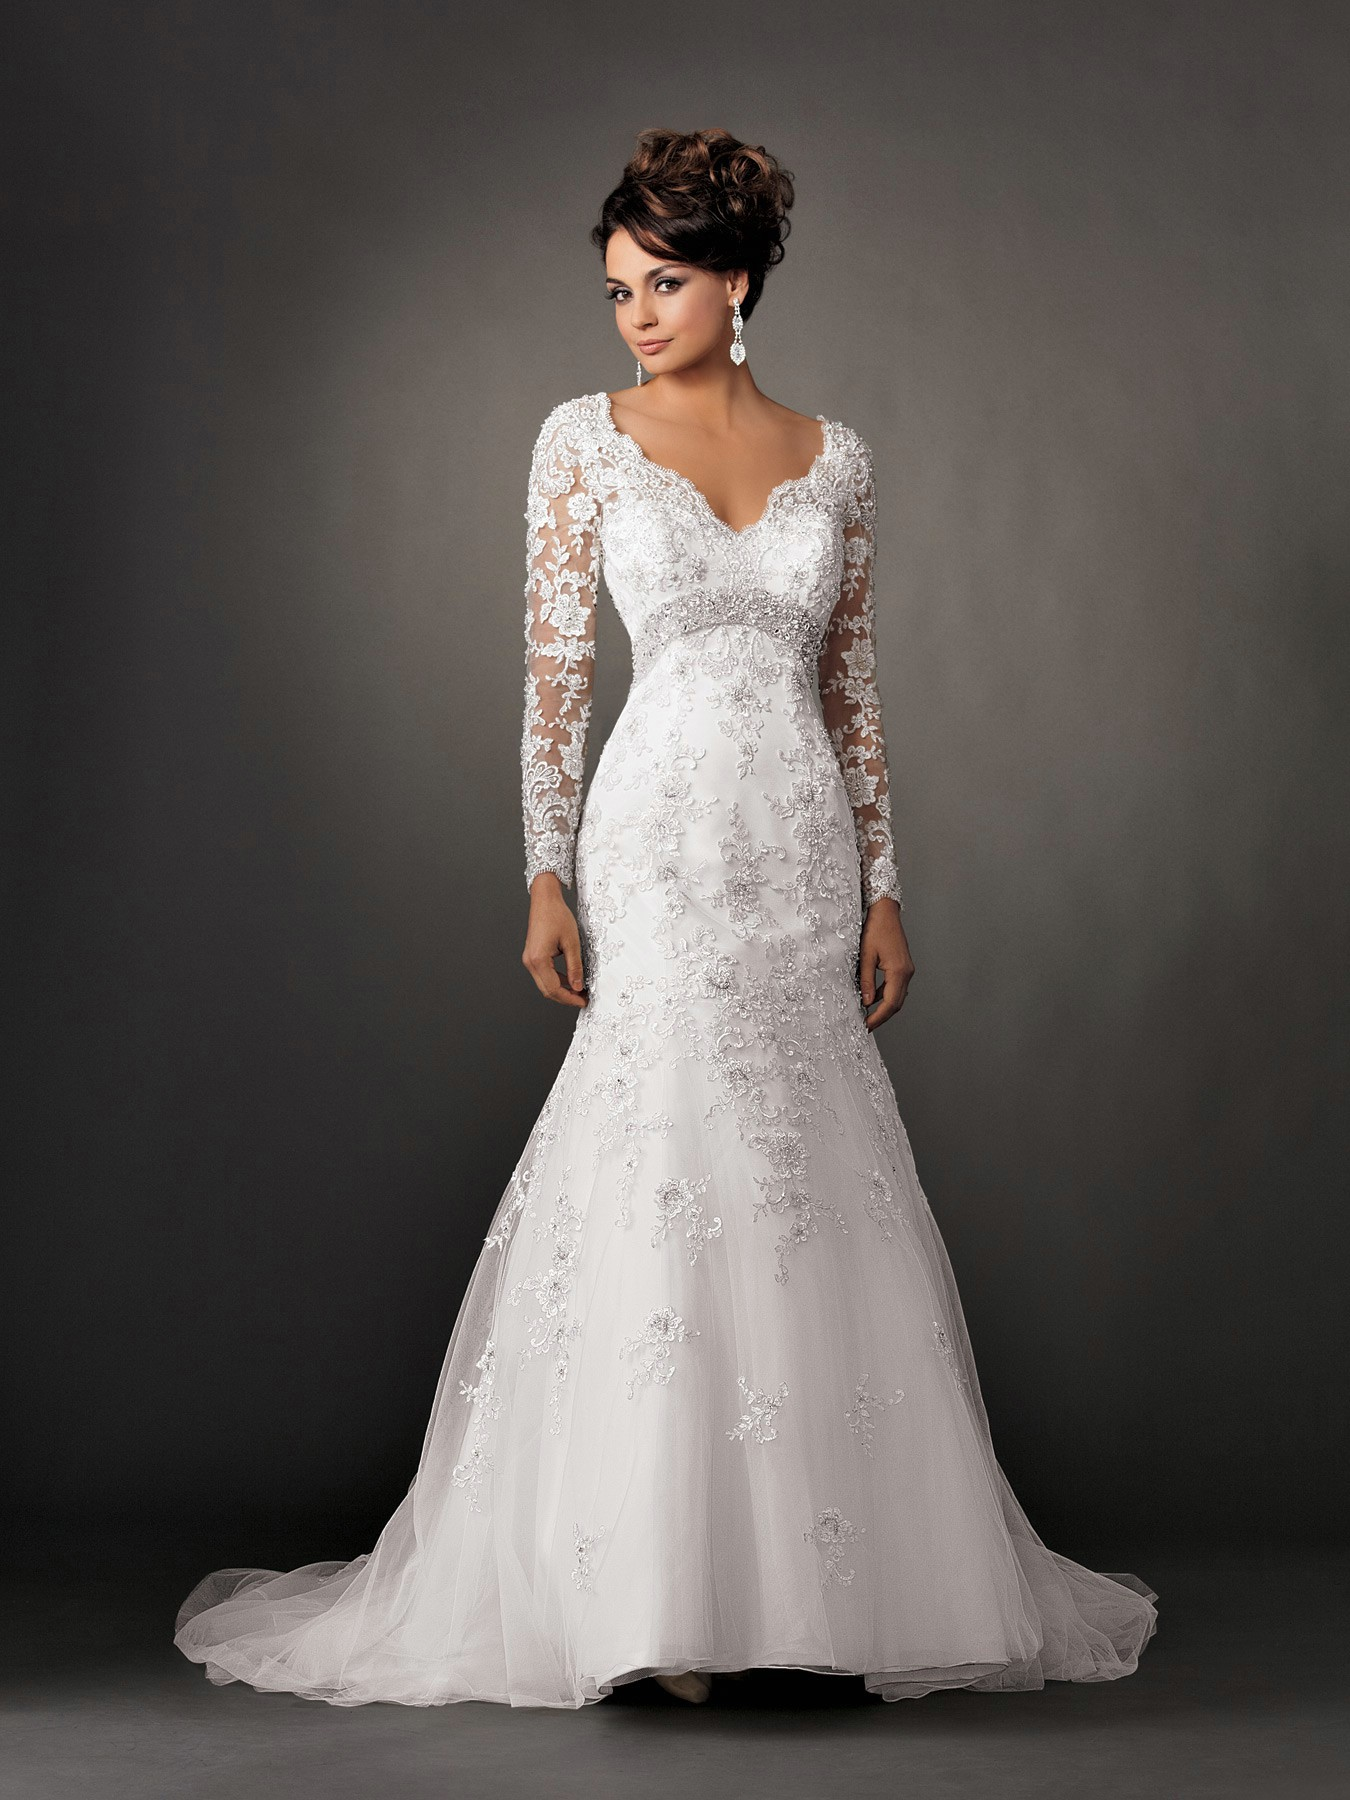 mermaid wedding dresses mermaid wedding gowns Lace Mermaid Wedding Dress